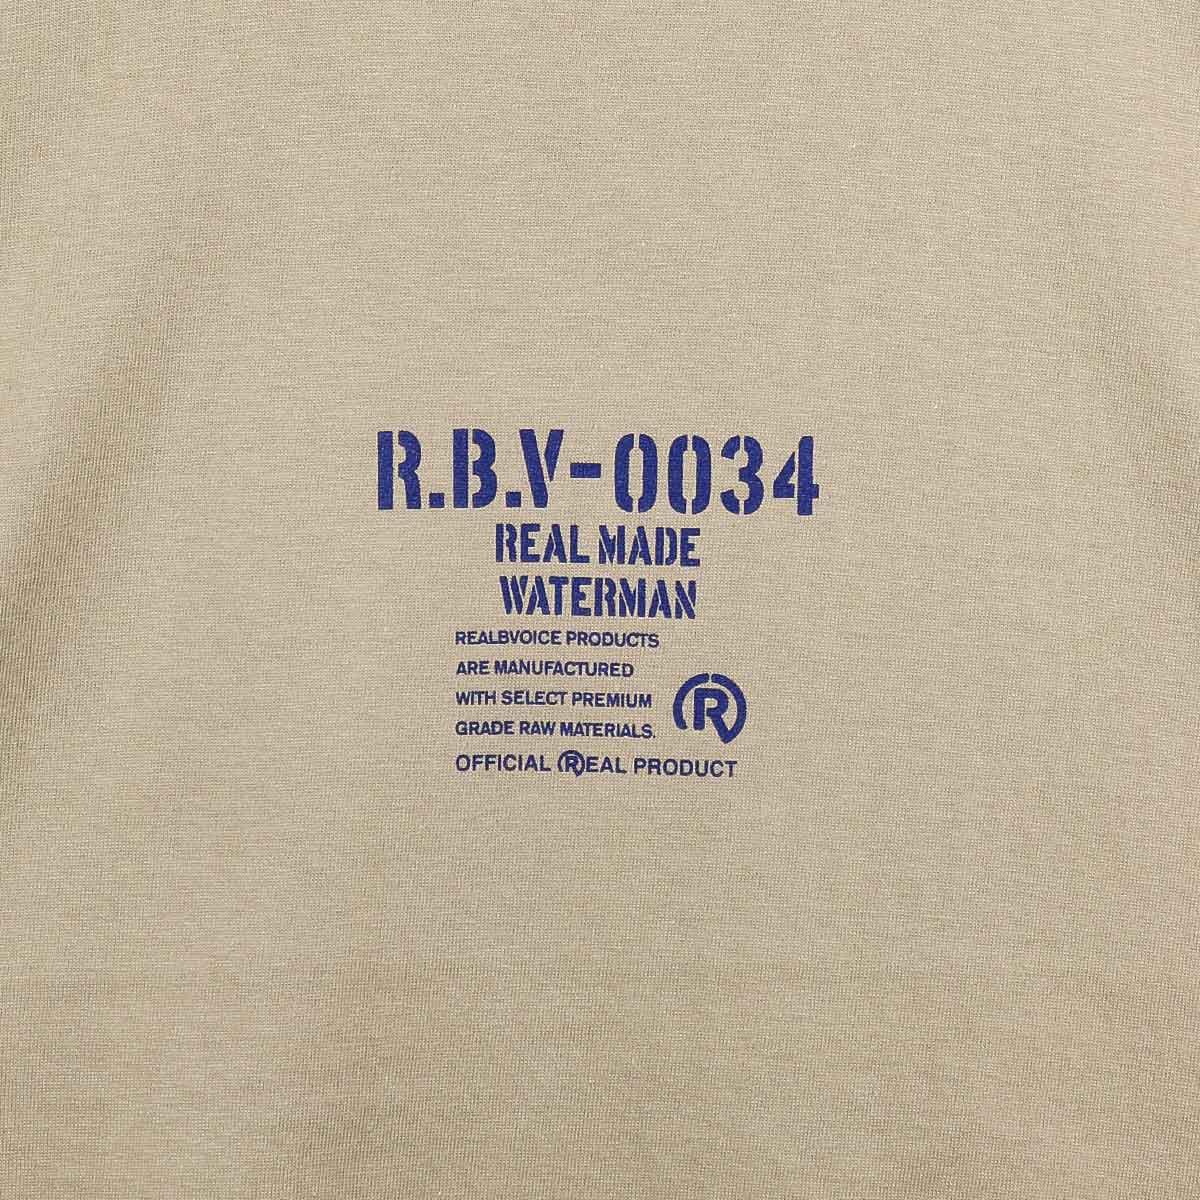 RBV-0034 T-SHIRT BIG SIZE